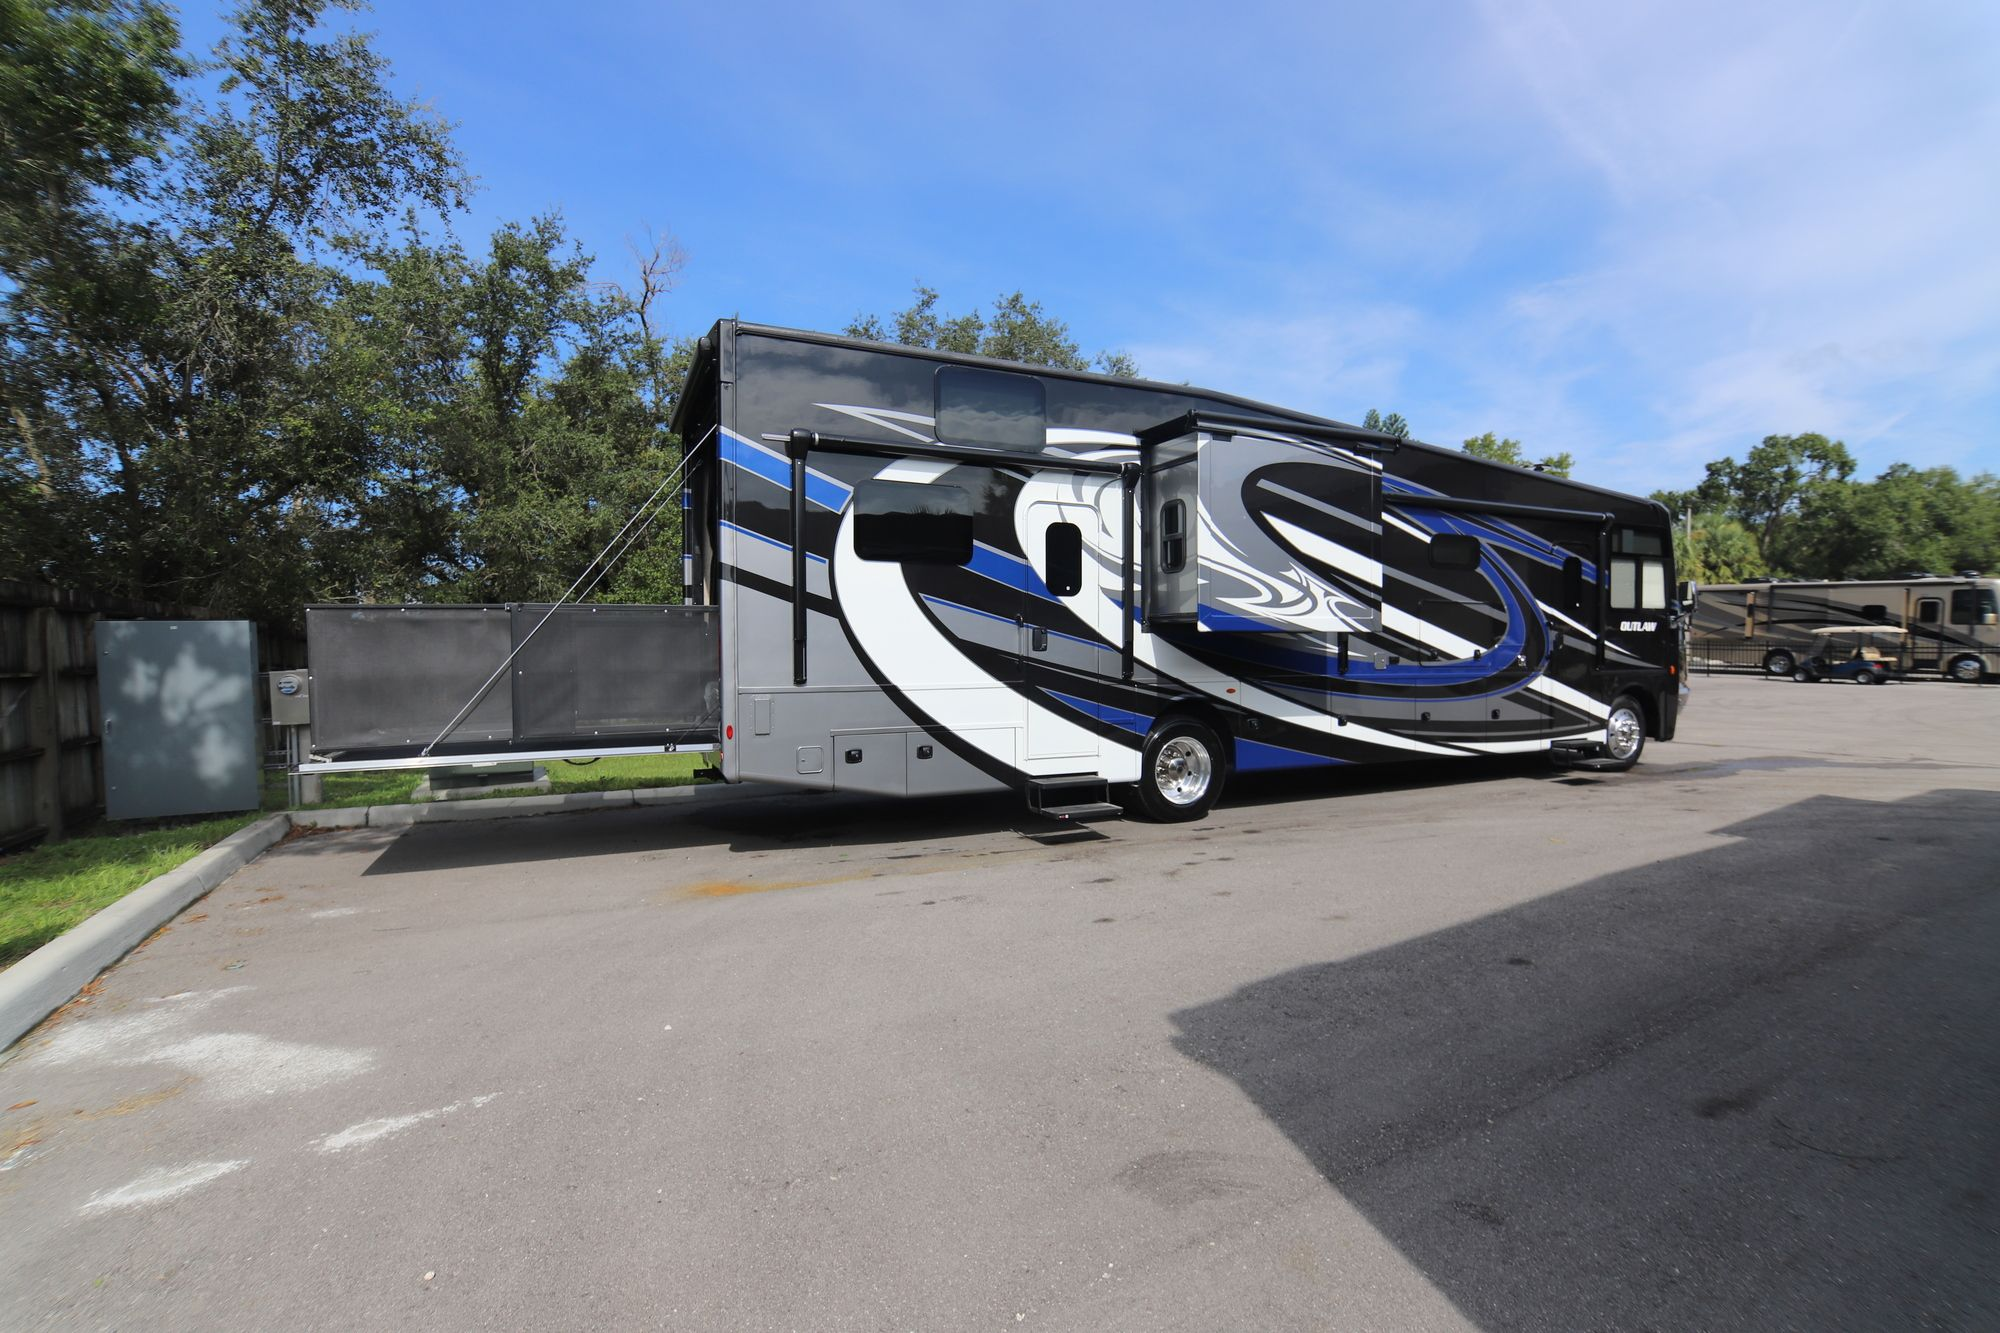 2019 Thor Motor Coach Outlaw 37rb Class A Gas Toyhauler